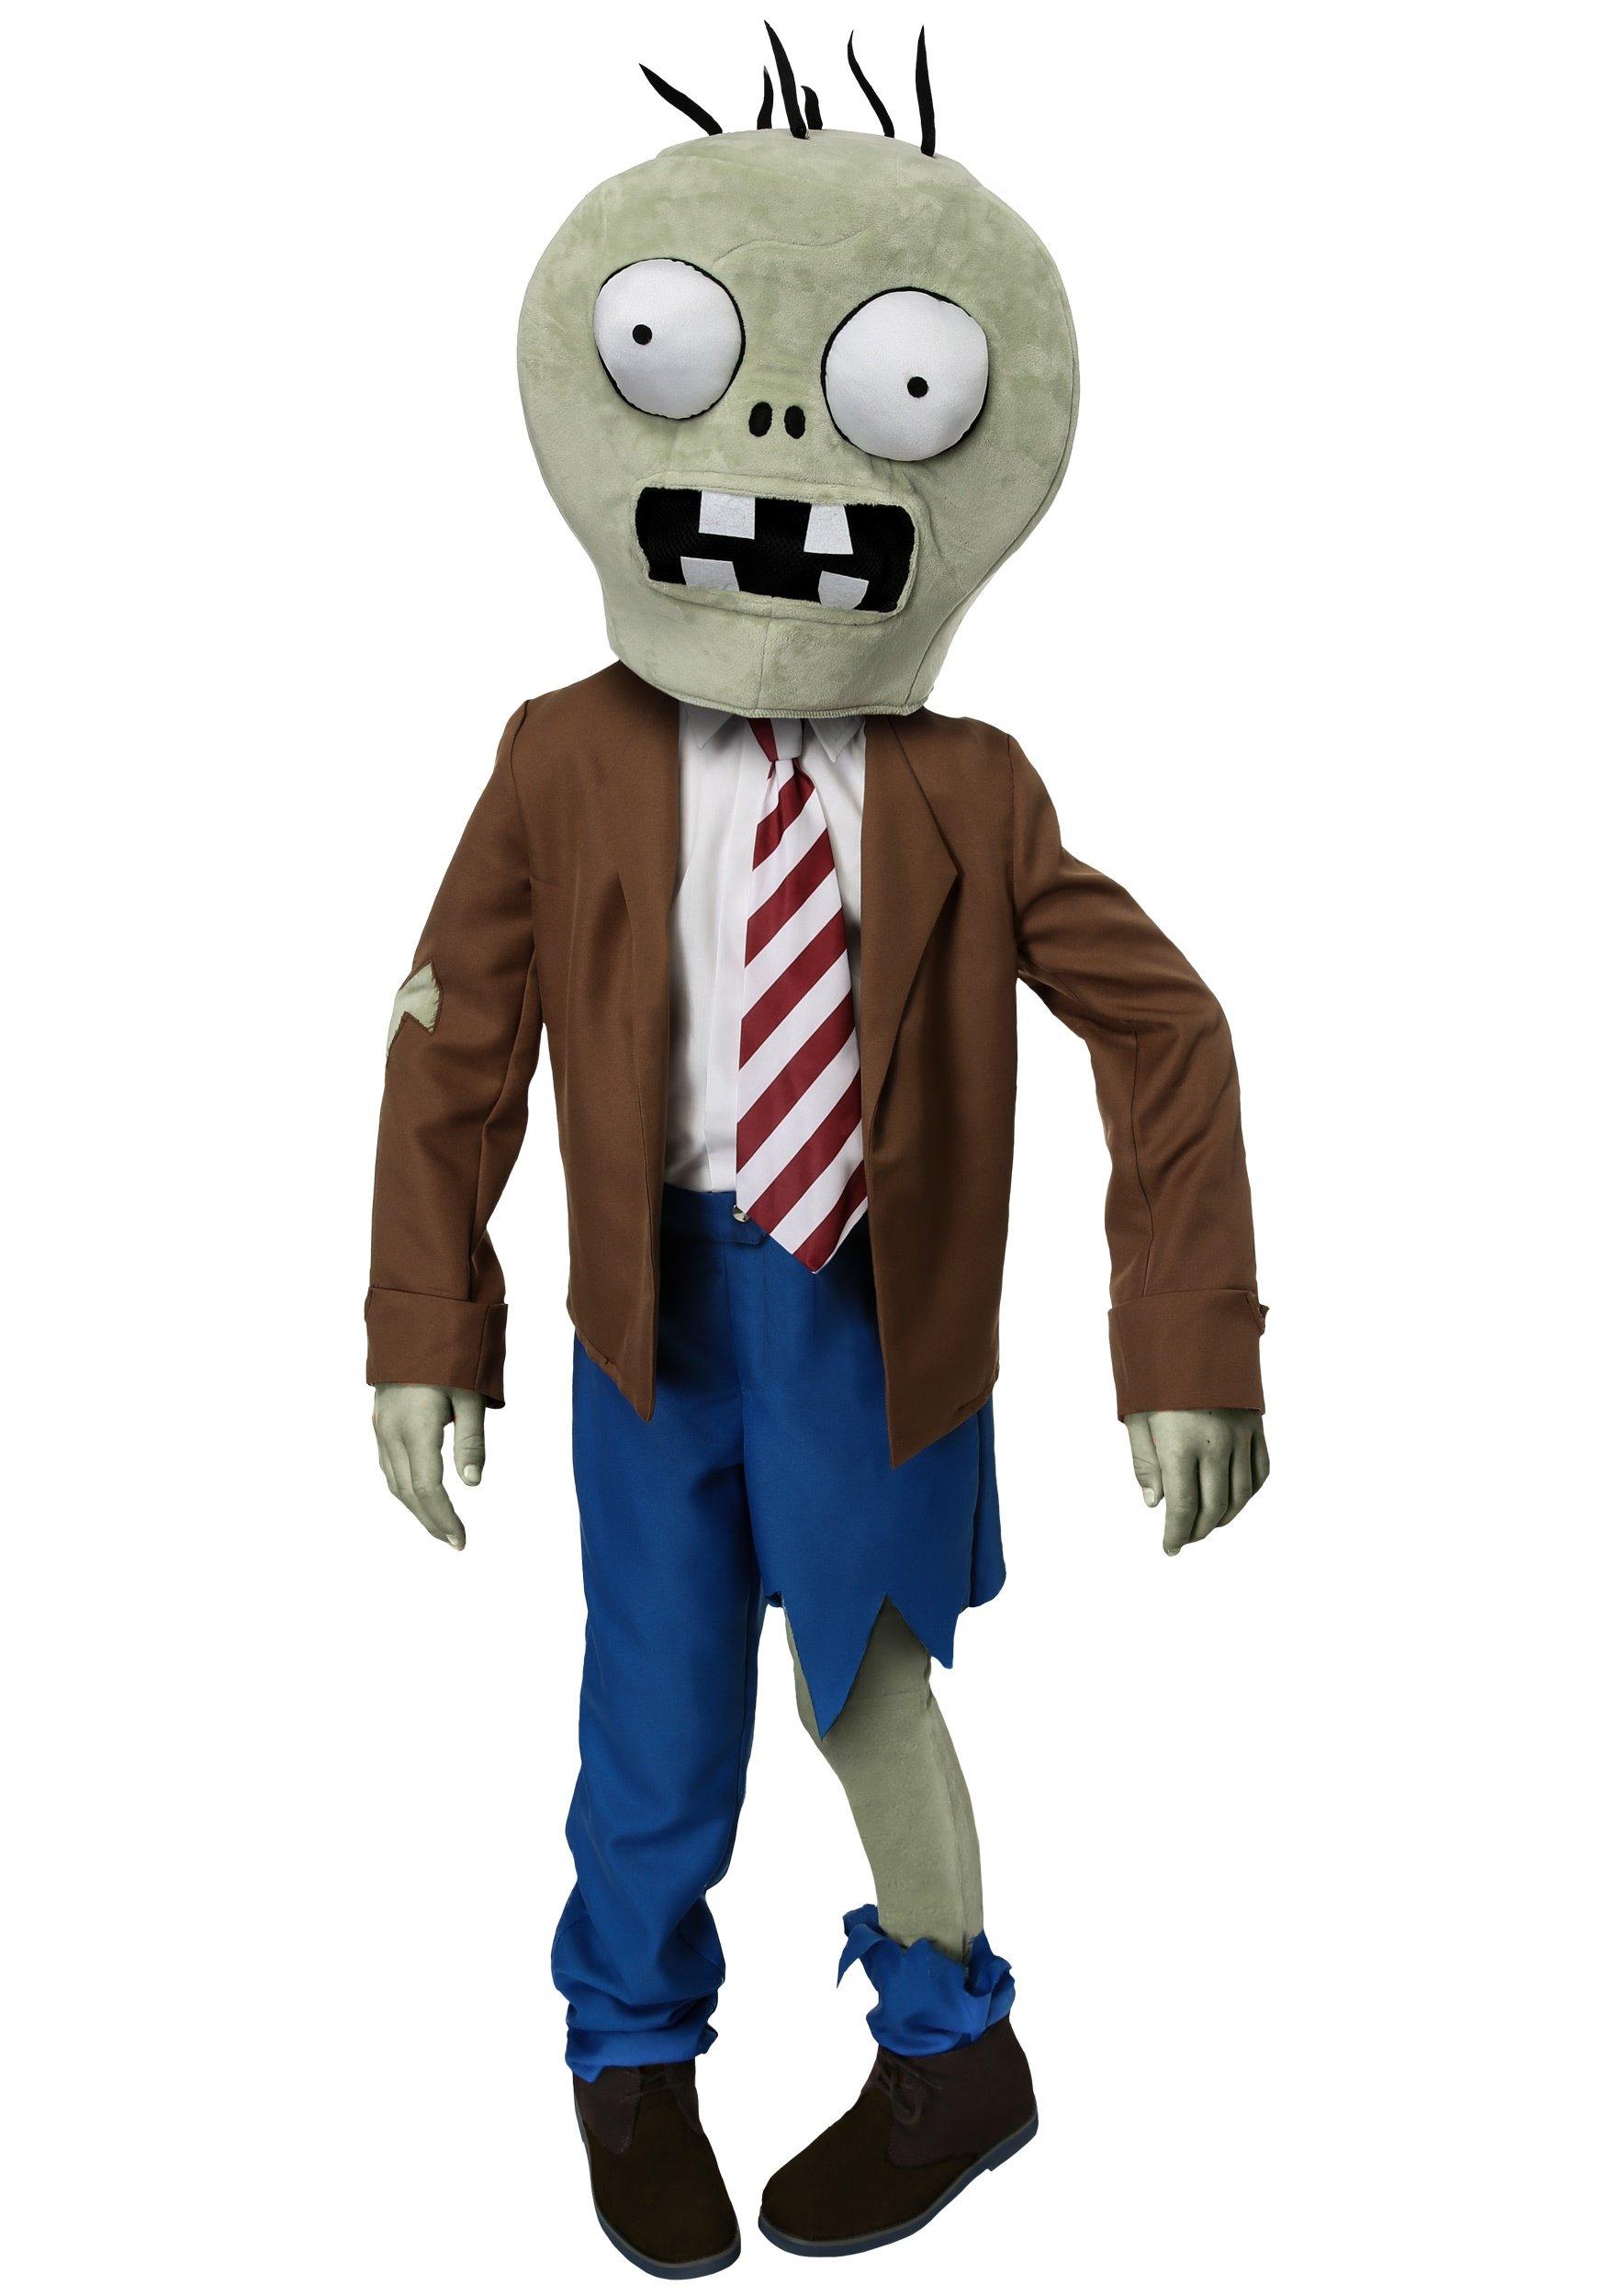 Kids PLANTS VS ZOMBIES Zombie Costume - XS by FunCostumes